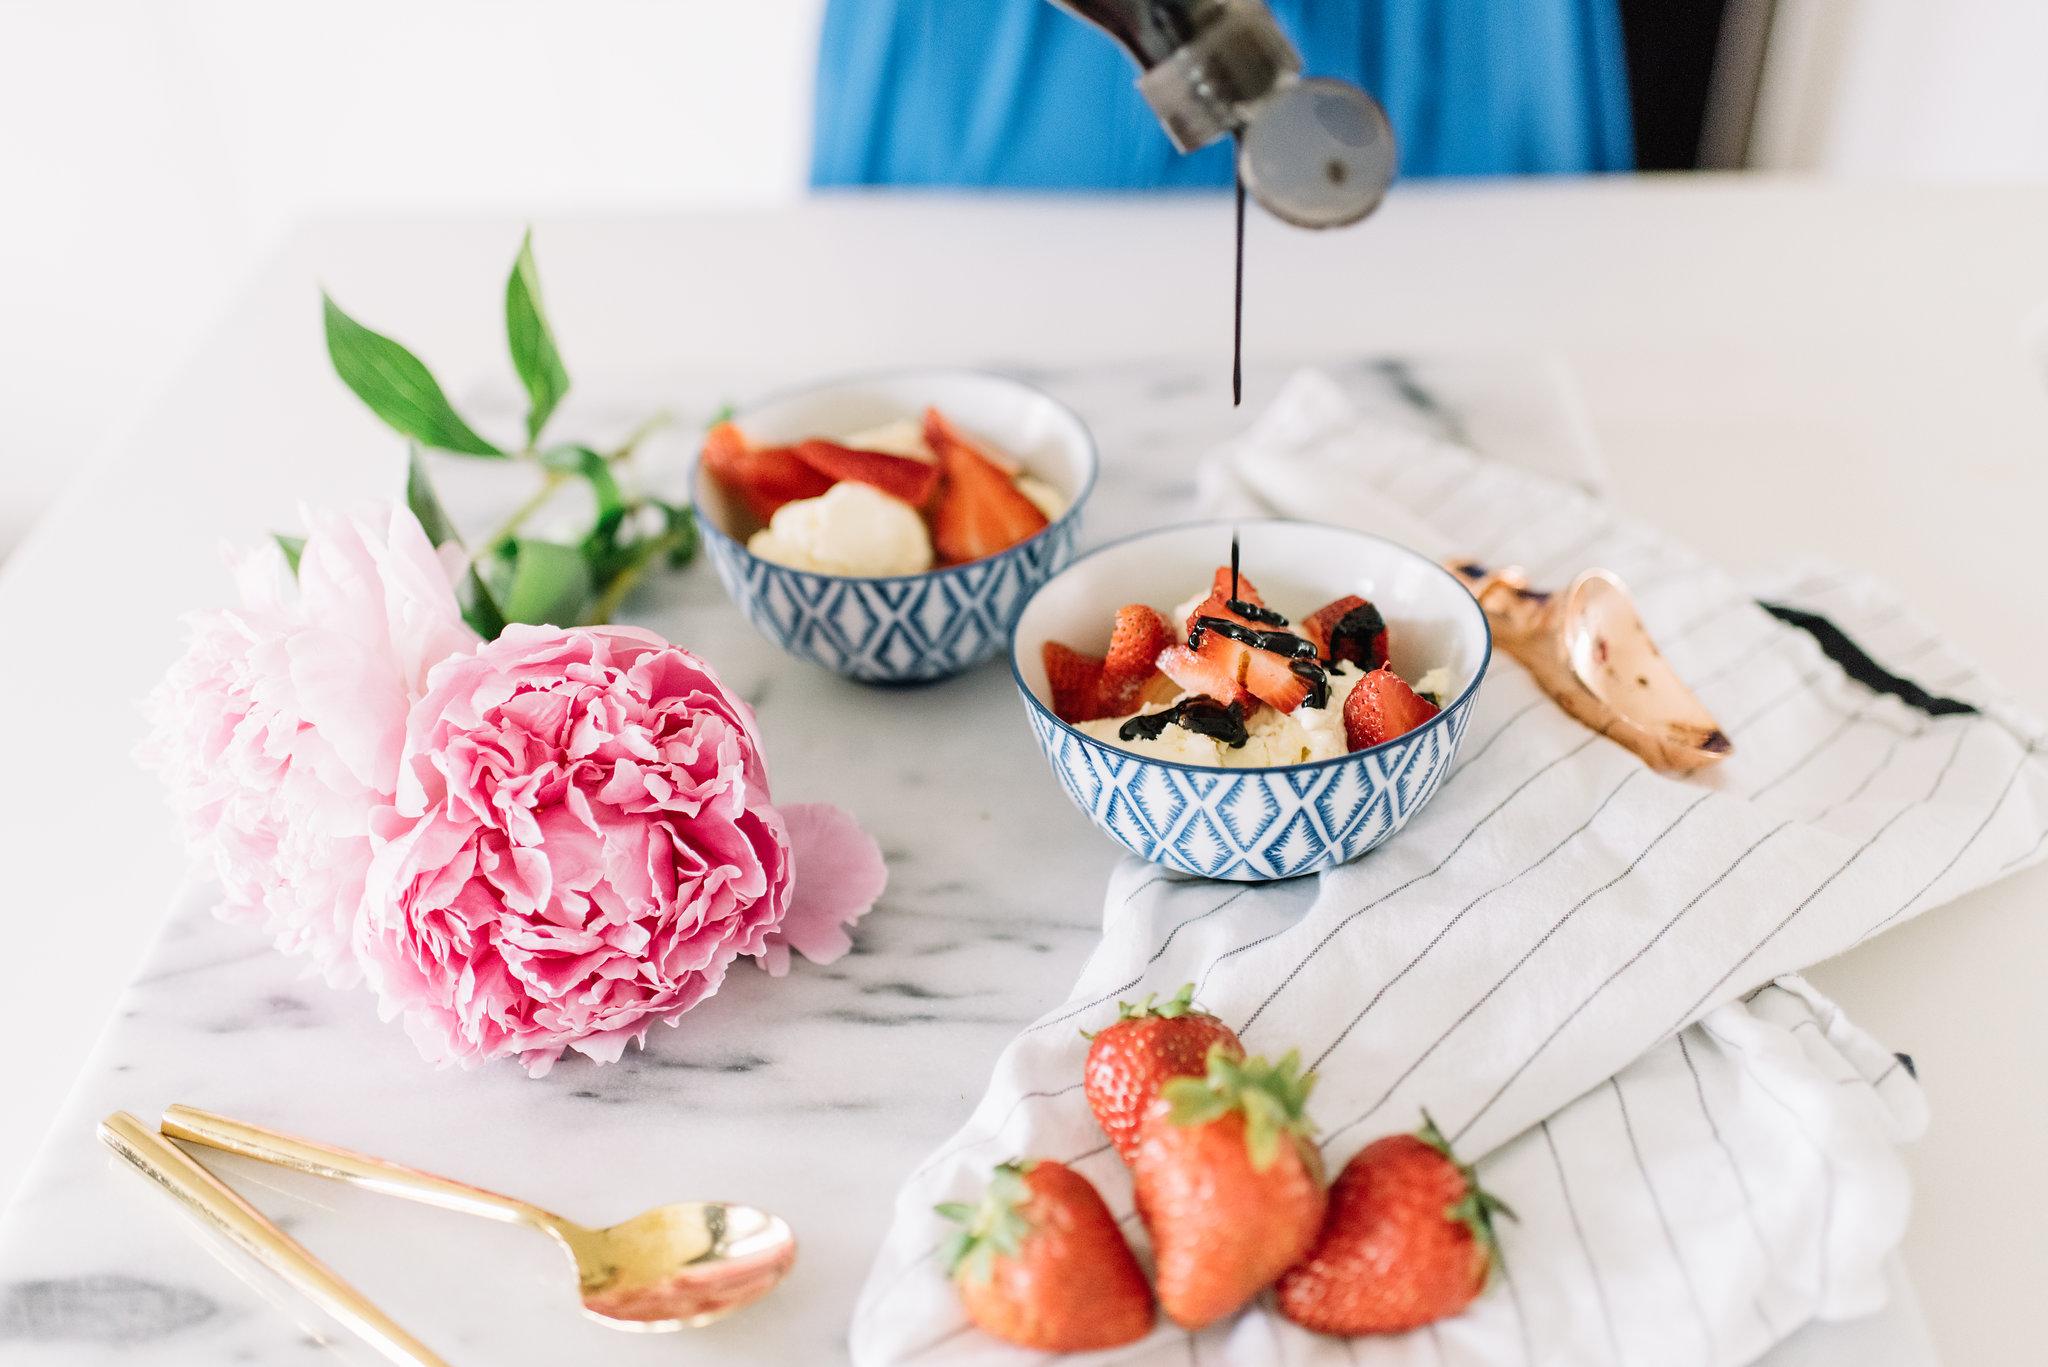 strawberries with balsamic glaze